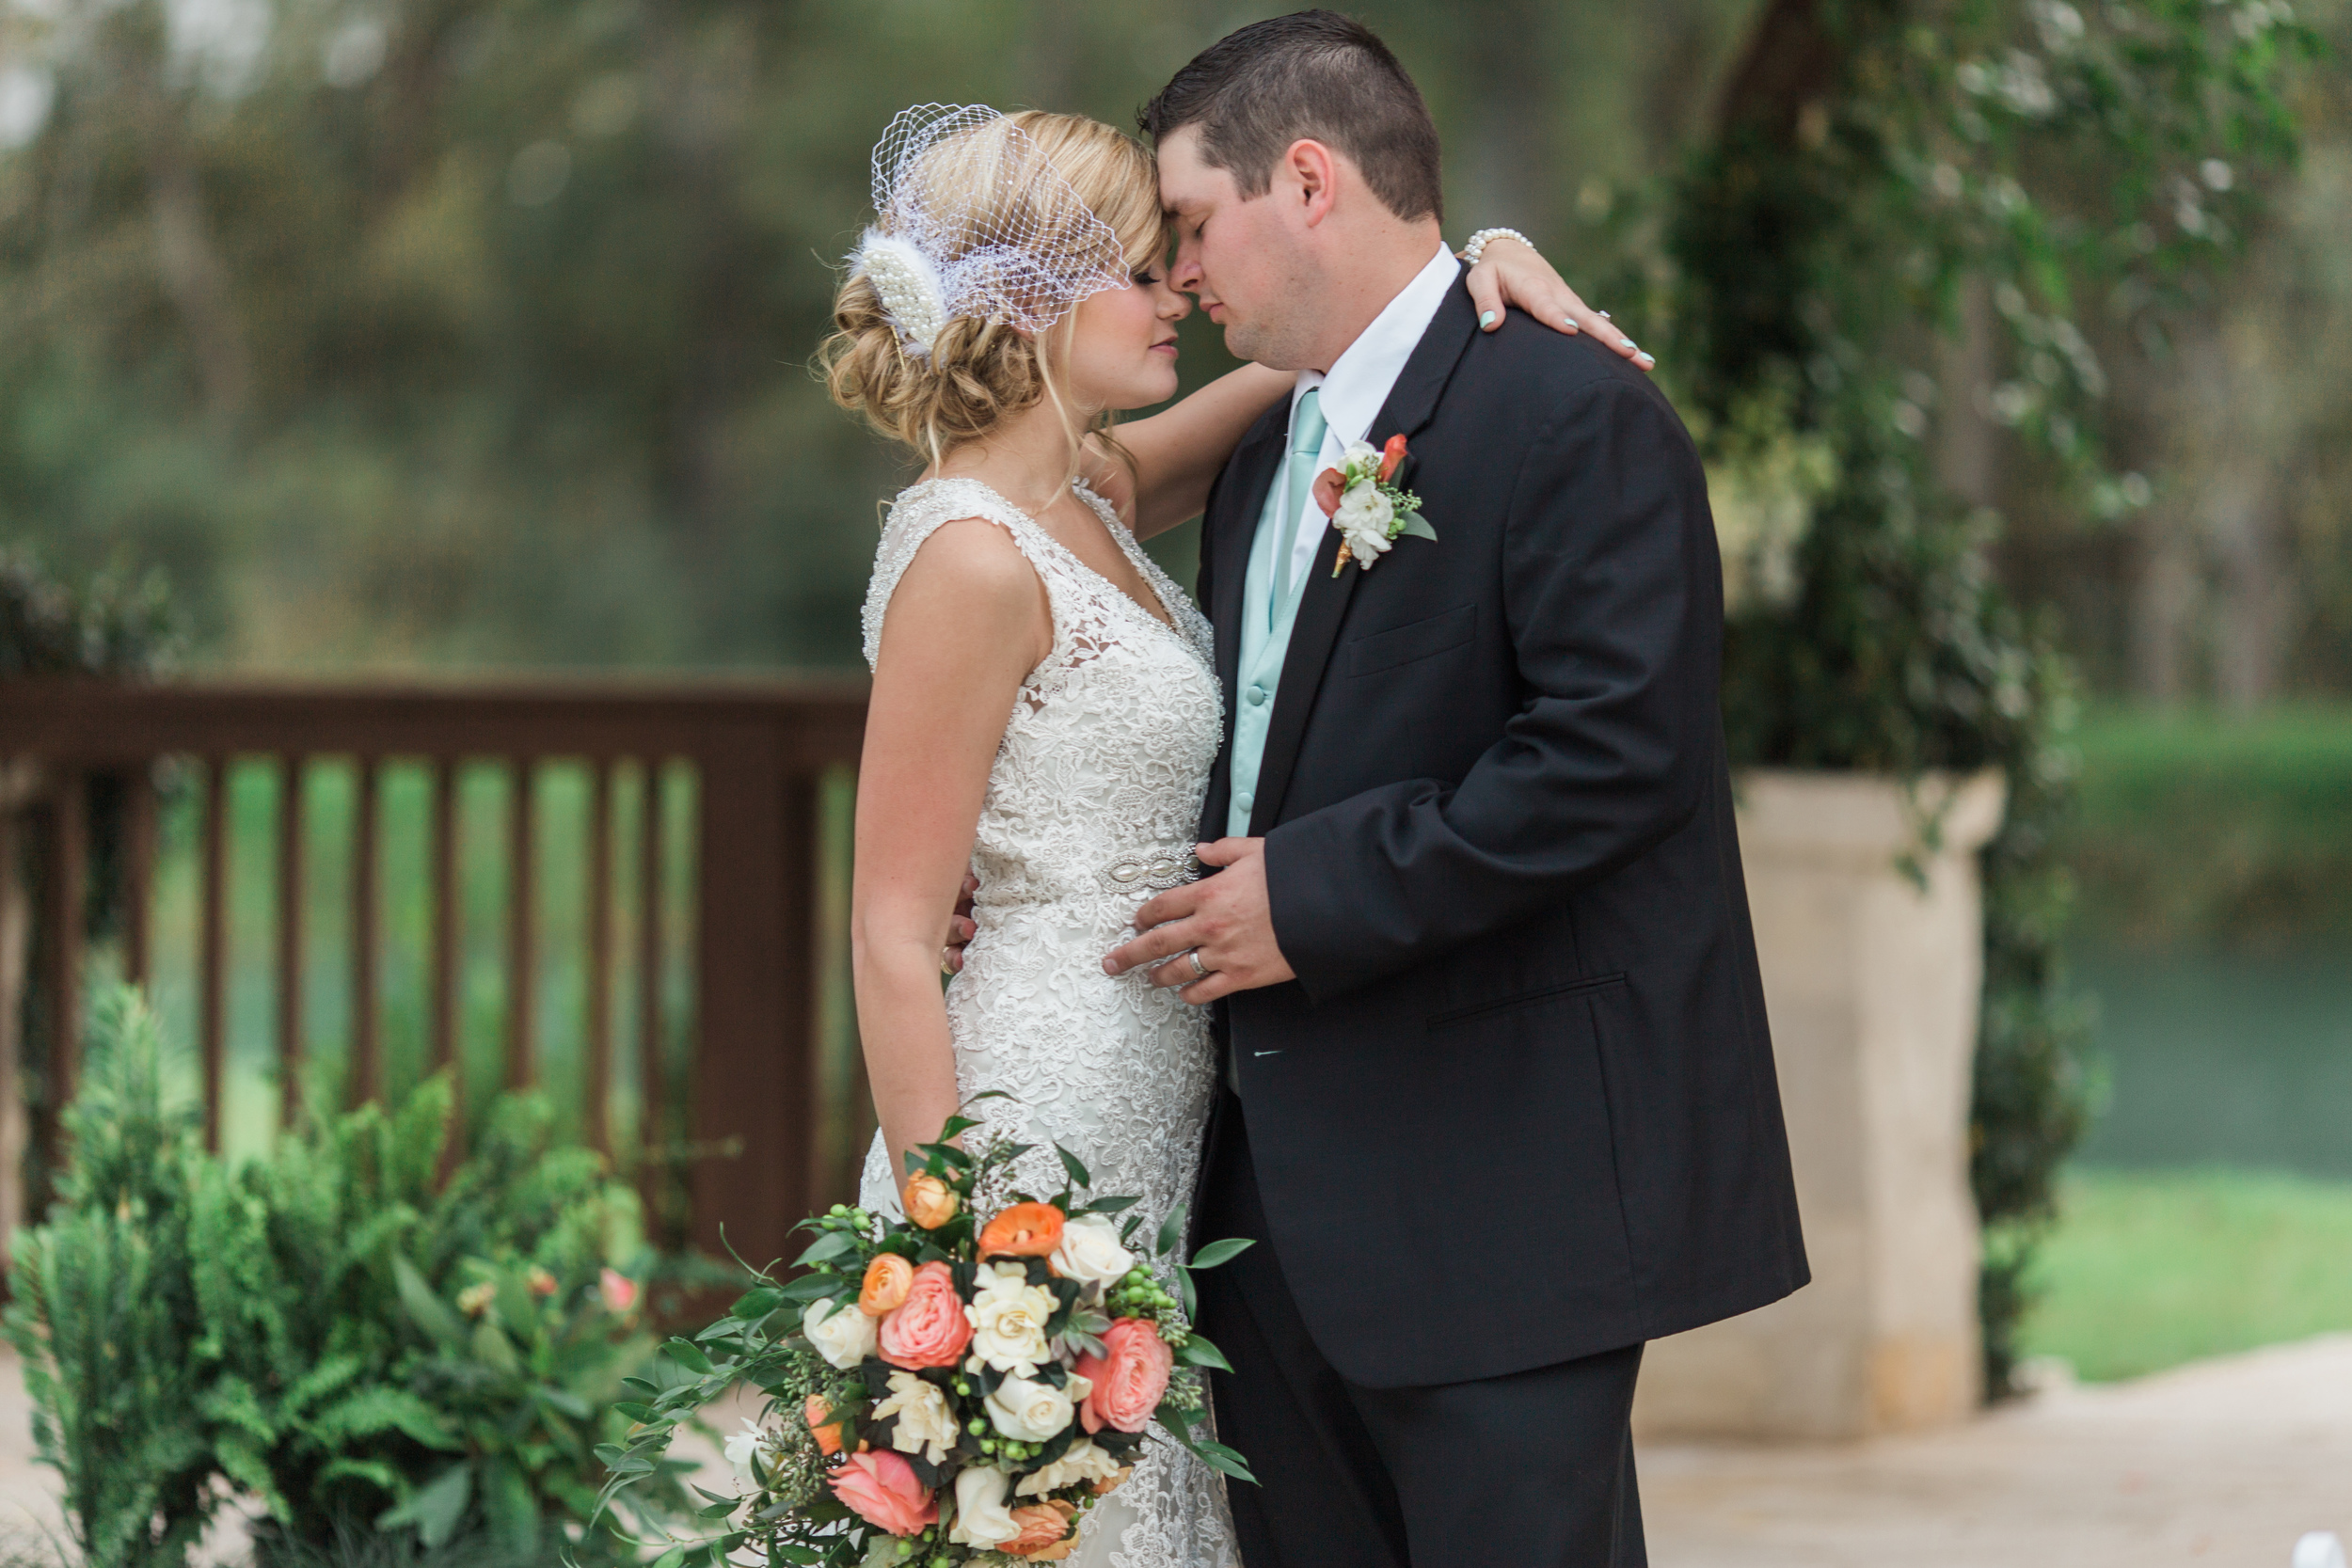 Plan Our Day Houston Wedding Coordinators | Wedding Blog | Country Wedding Inspiration at Pecan Springs in Brookshire, TX |Houston Luxury Wedding Planning